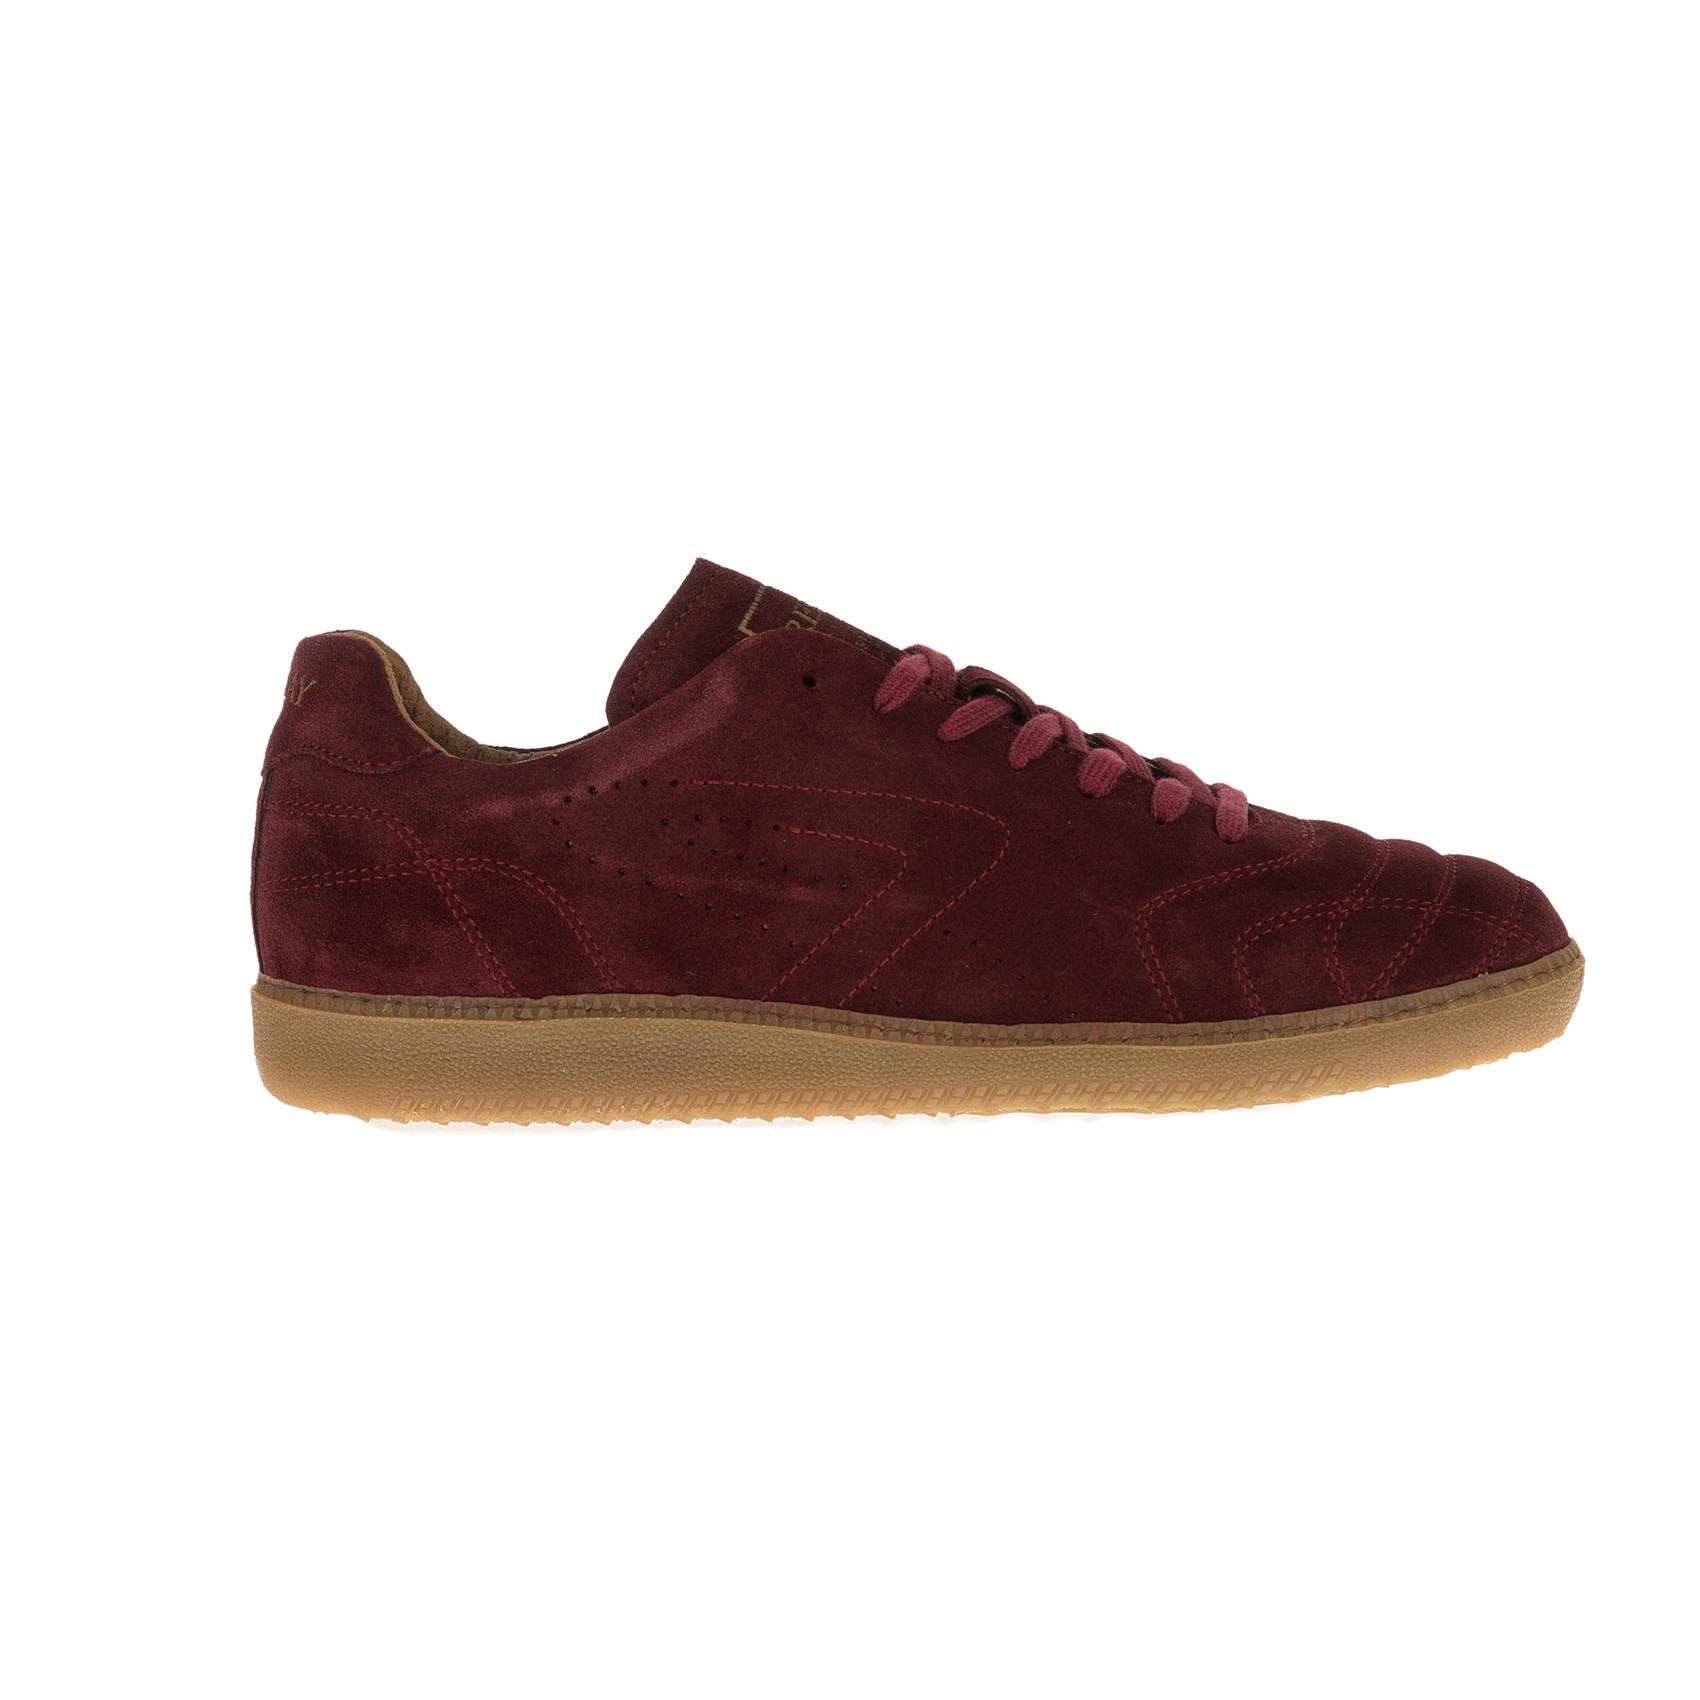 REPLAY - Ανδρικά sneakers REPLAY μπορντό ανδρικά παπούτσια sneakers